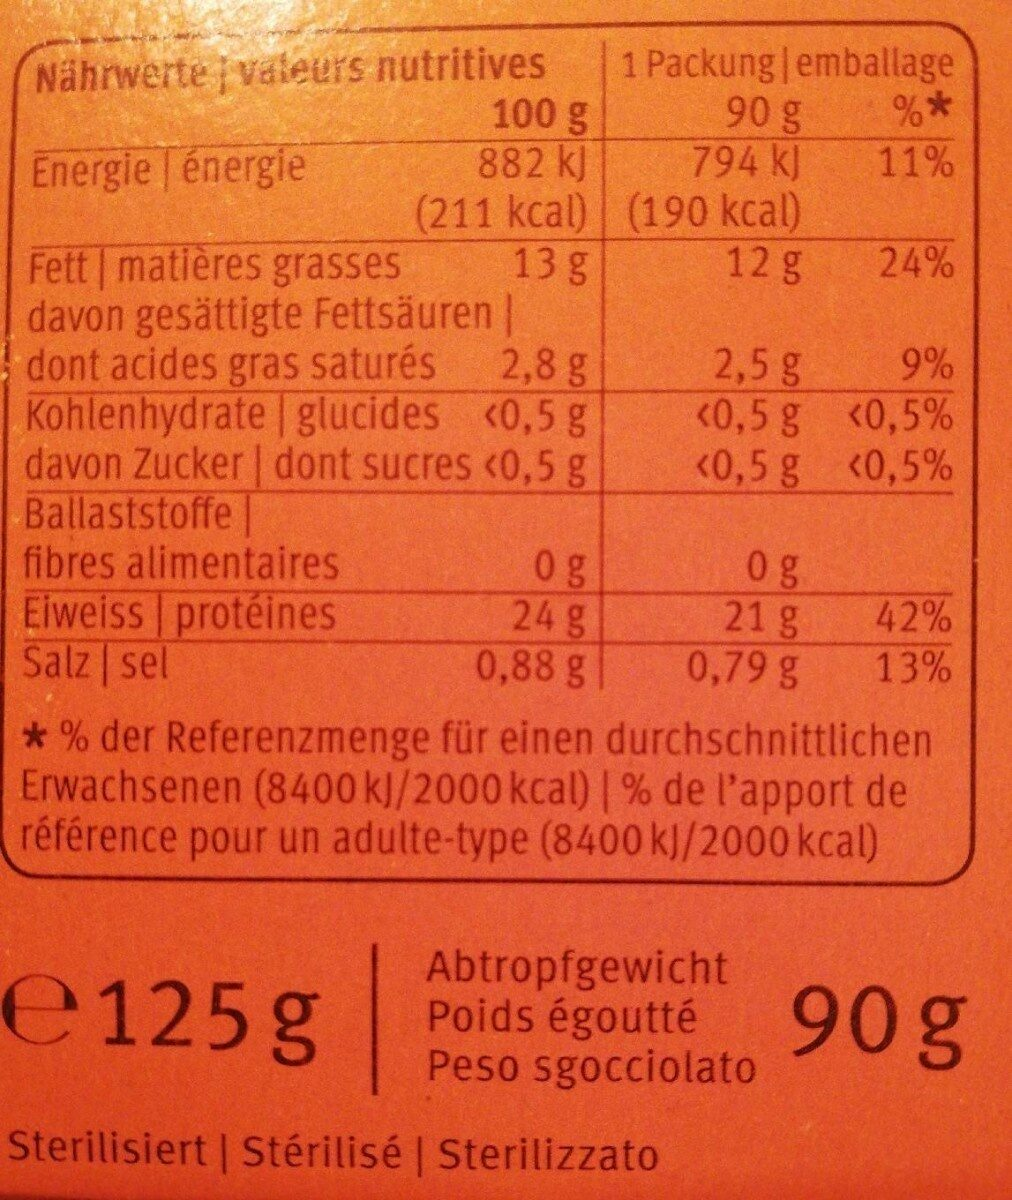 Filets de maqueraux - Valori nutrizionali - fr